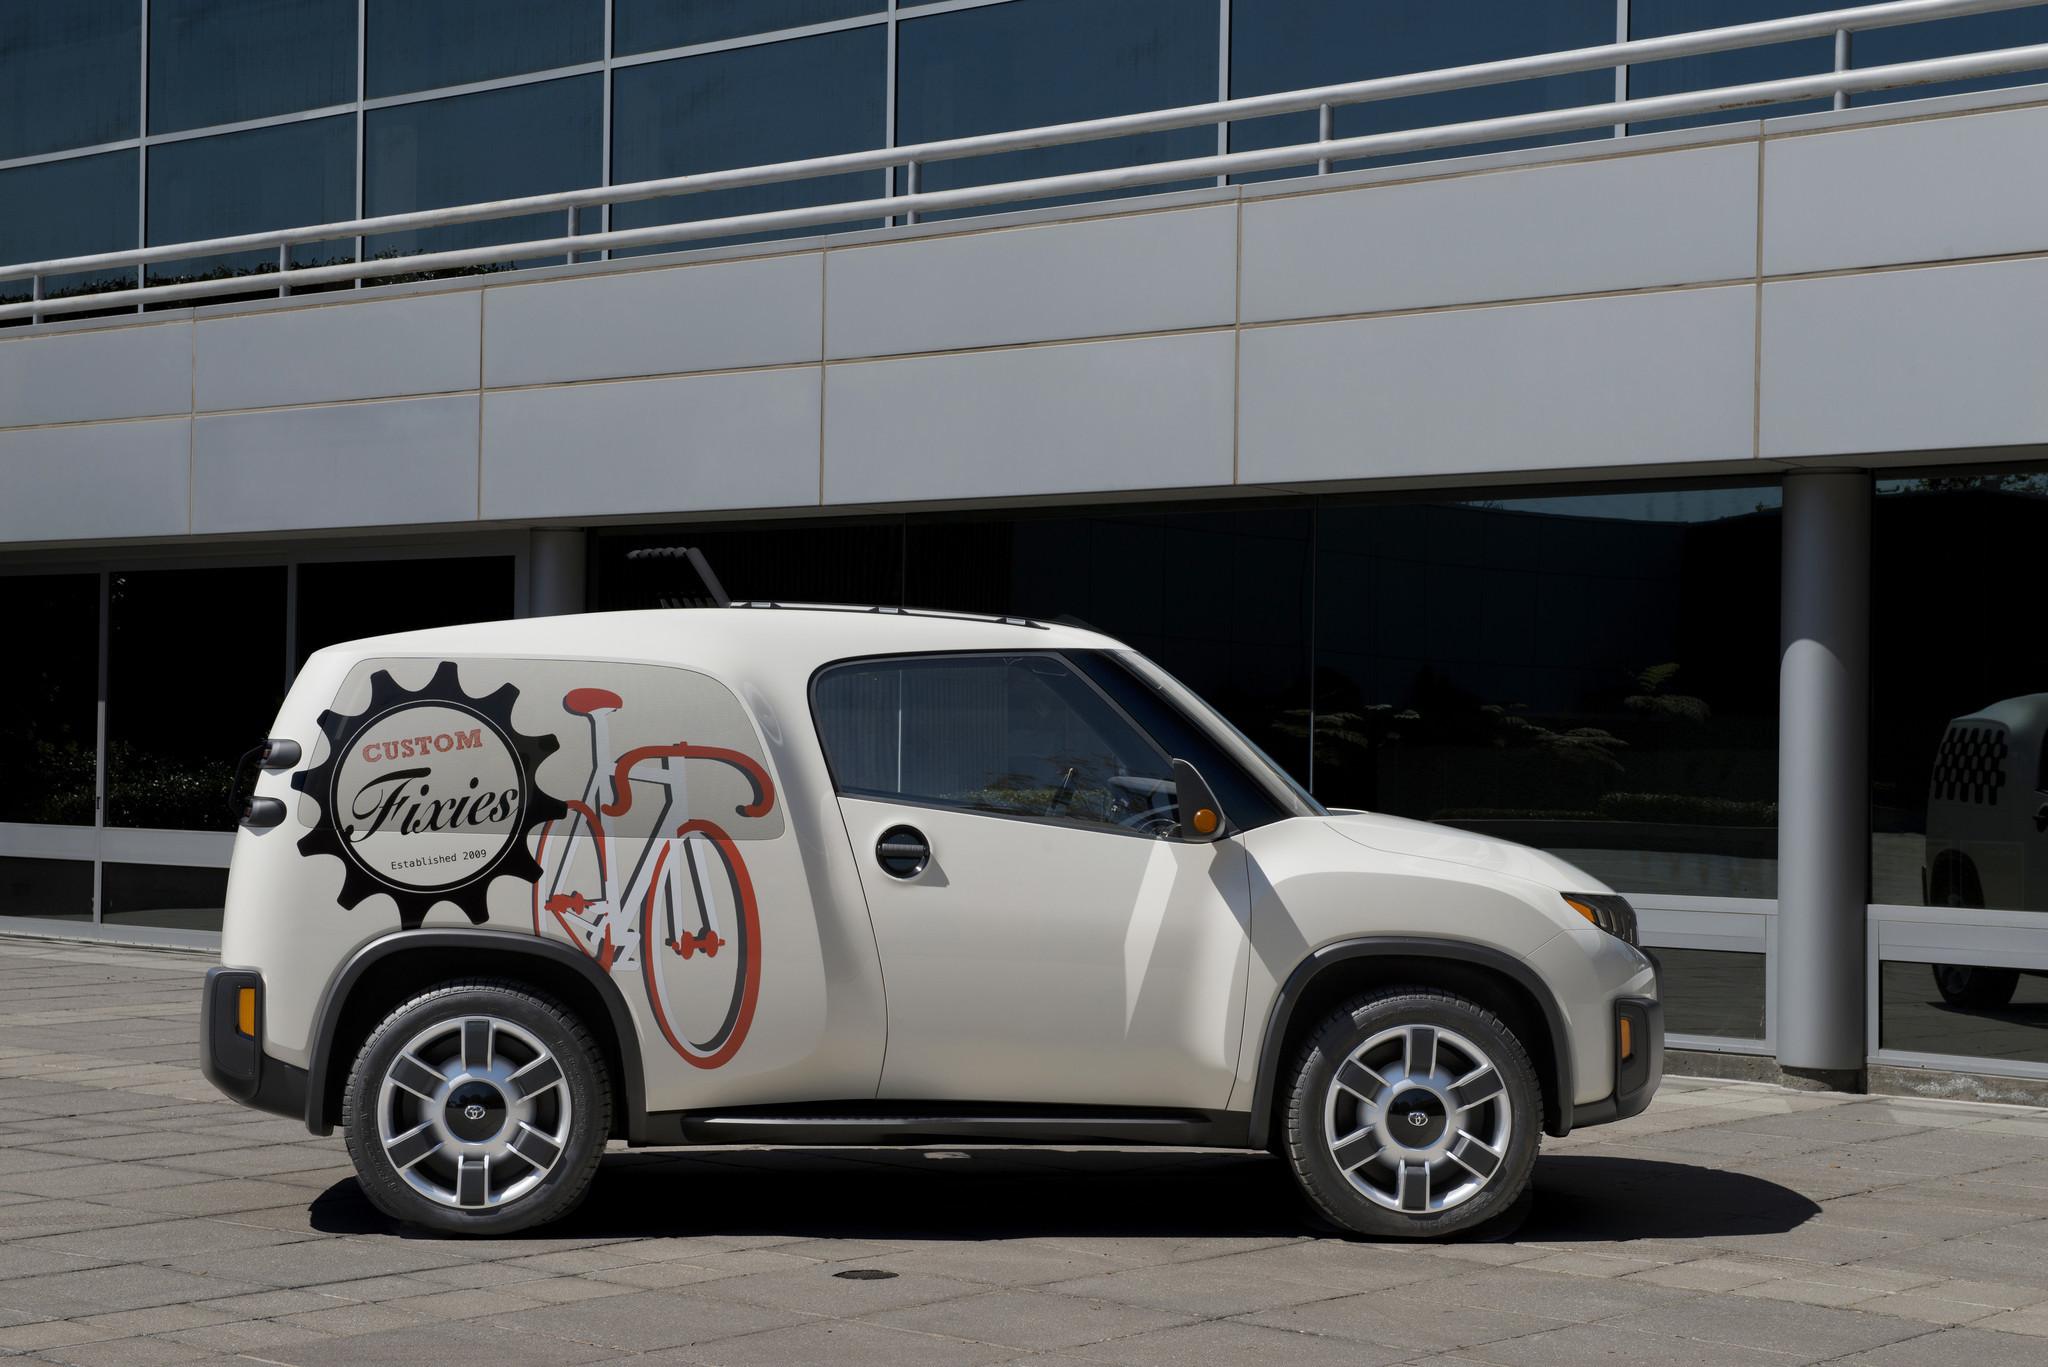 Toyota unveils urban utility concept vehicle dubbed U2